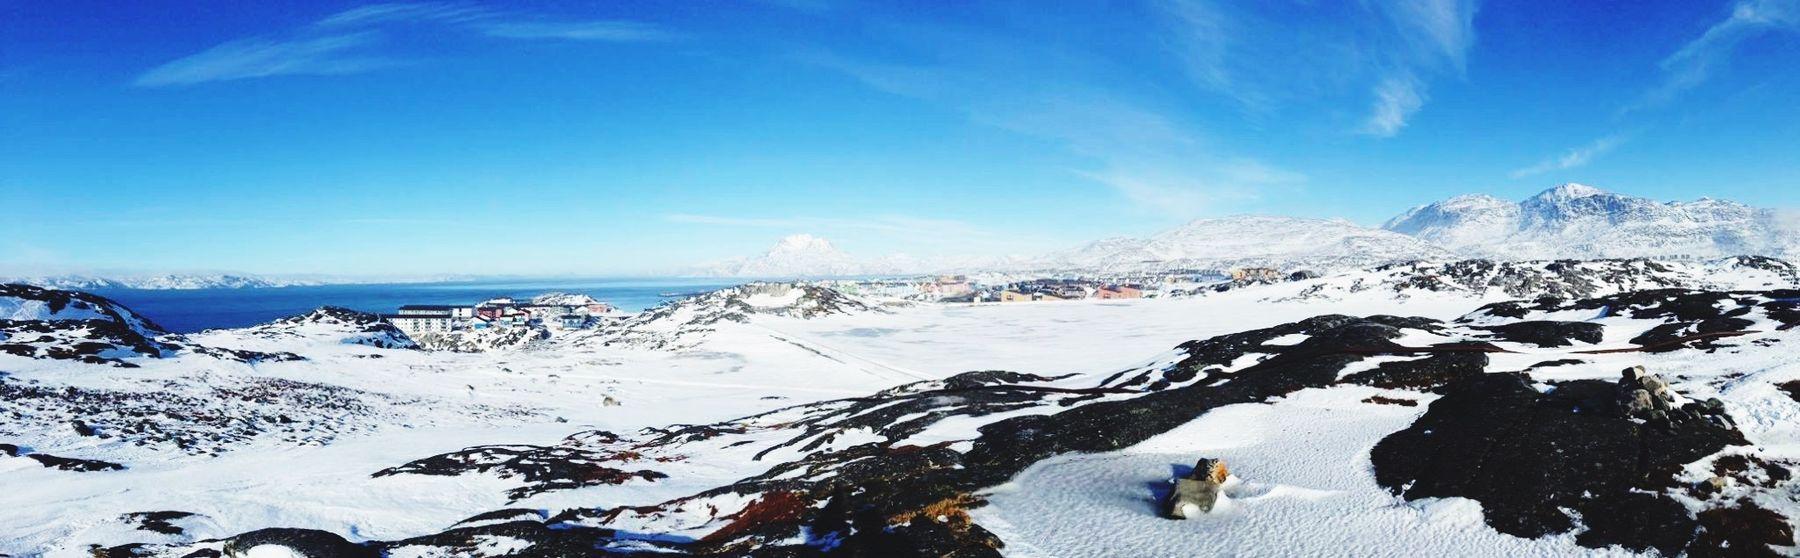 Panorama Check This Out Enjoying Life Wonderfuld Greenland The Real Greenland Its A Beautiful Day Sunny Day Sunny Day 🌞 Sunny Winter Day